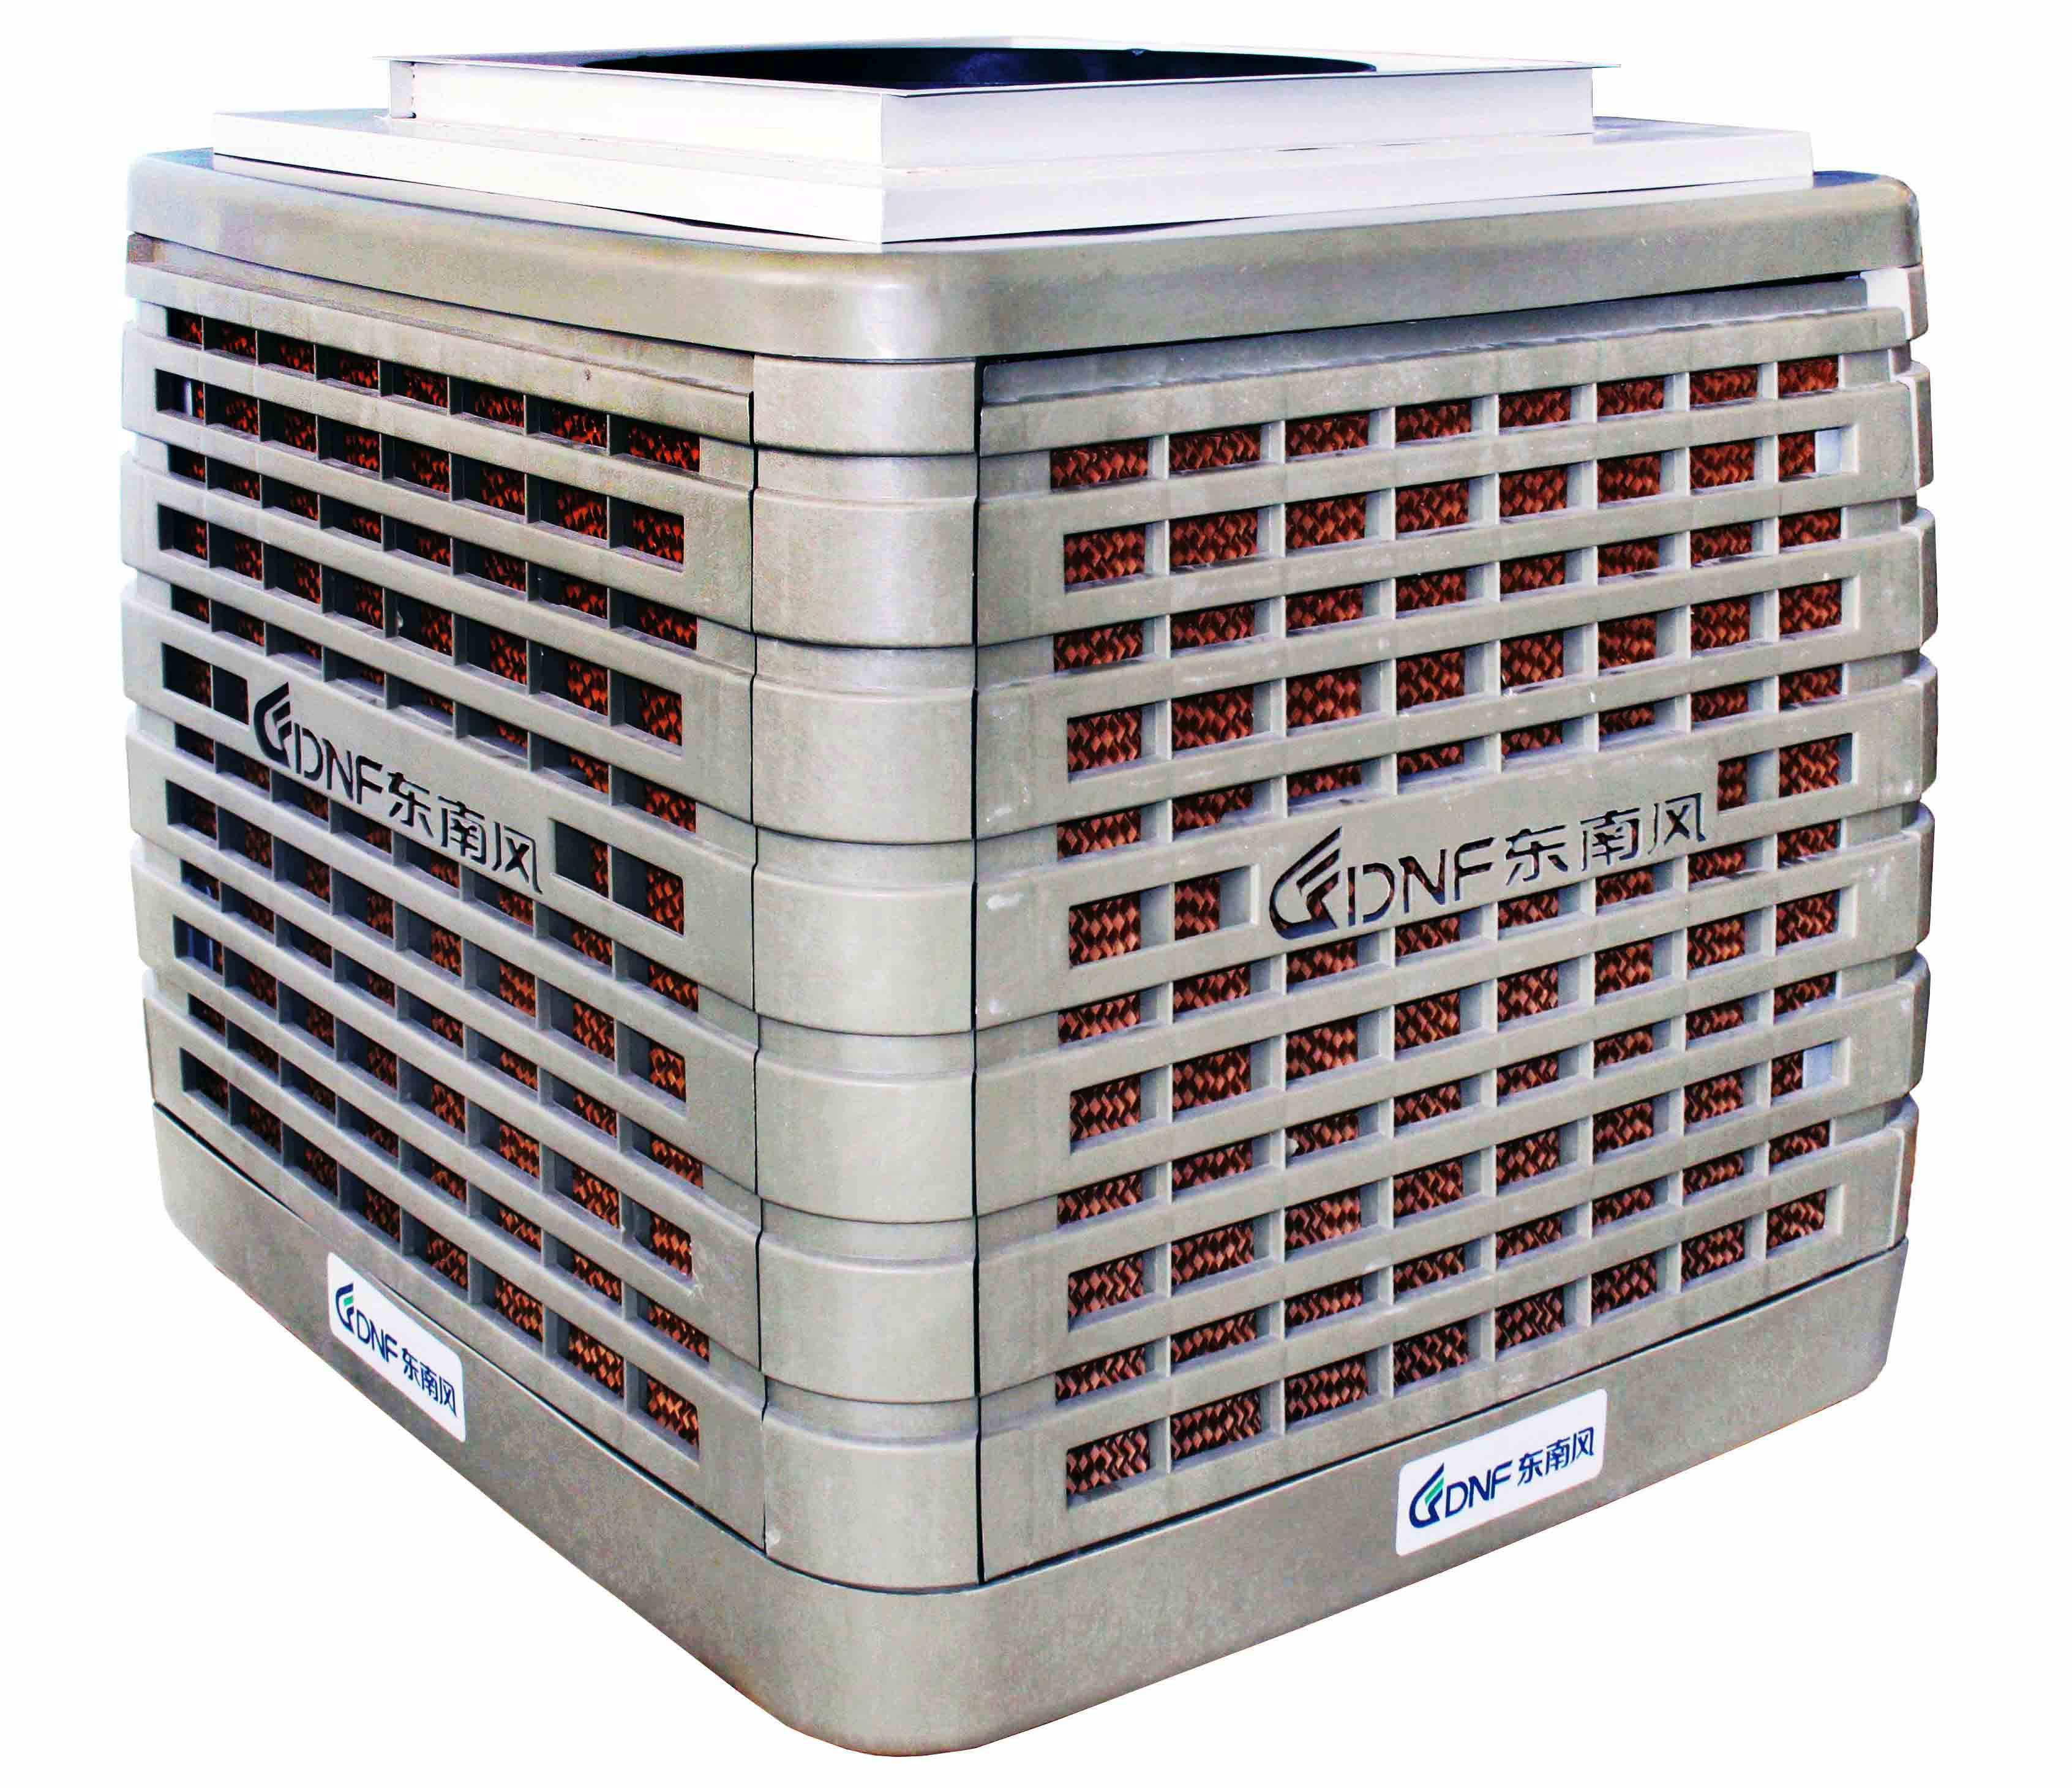 ENVIRONMENTAL EVAPORATIVE AIR COOLER AIR CONDITIONER